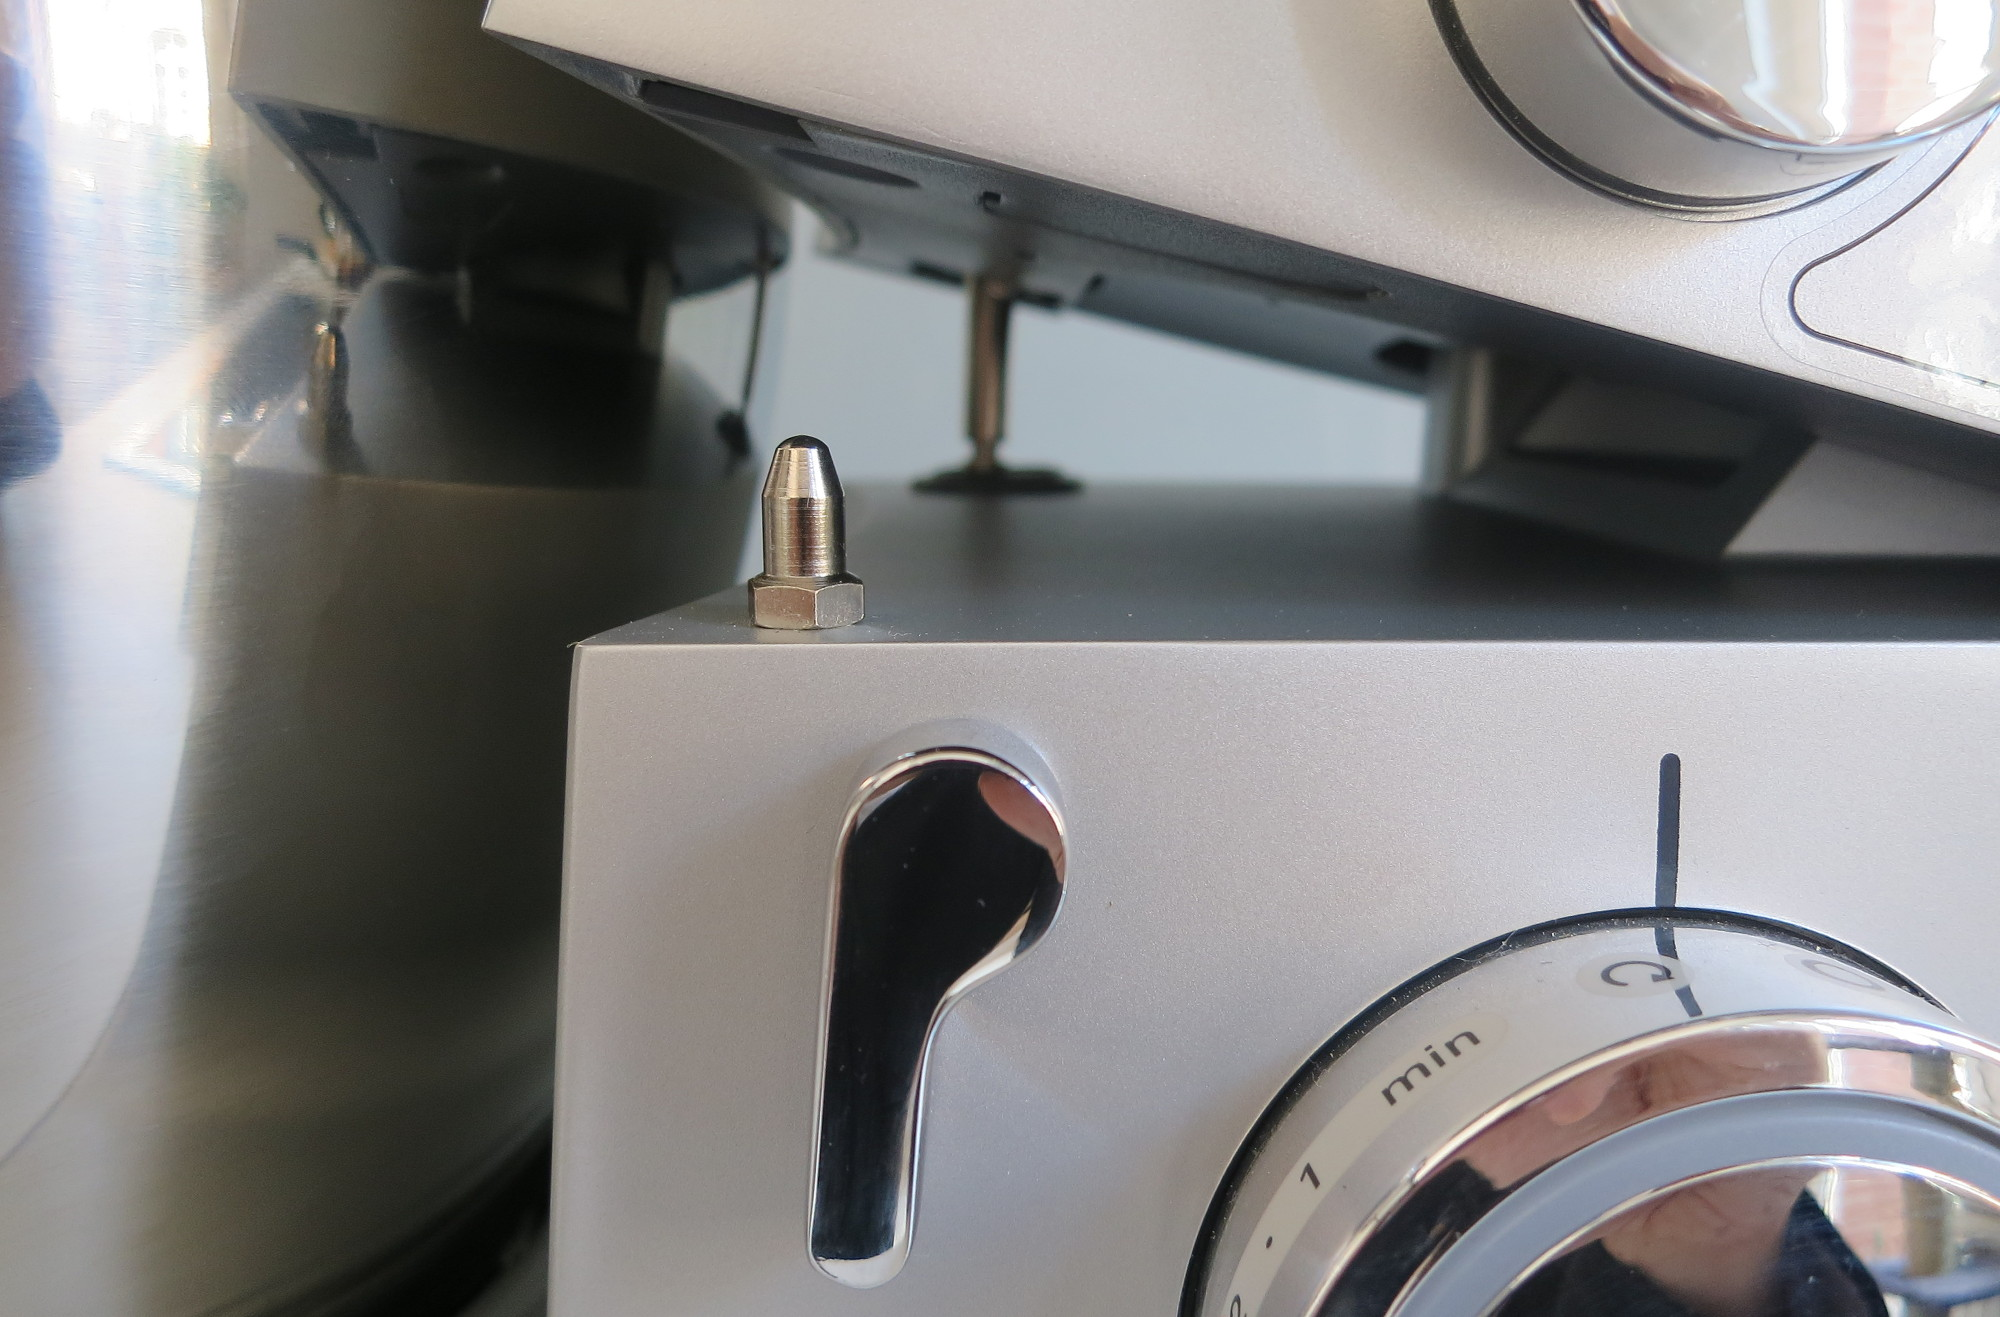 Öffnungsmechanismus der Kenwood Cooking Chef Gourmet